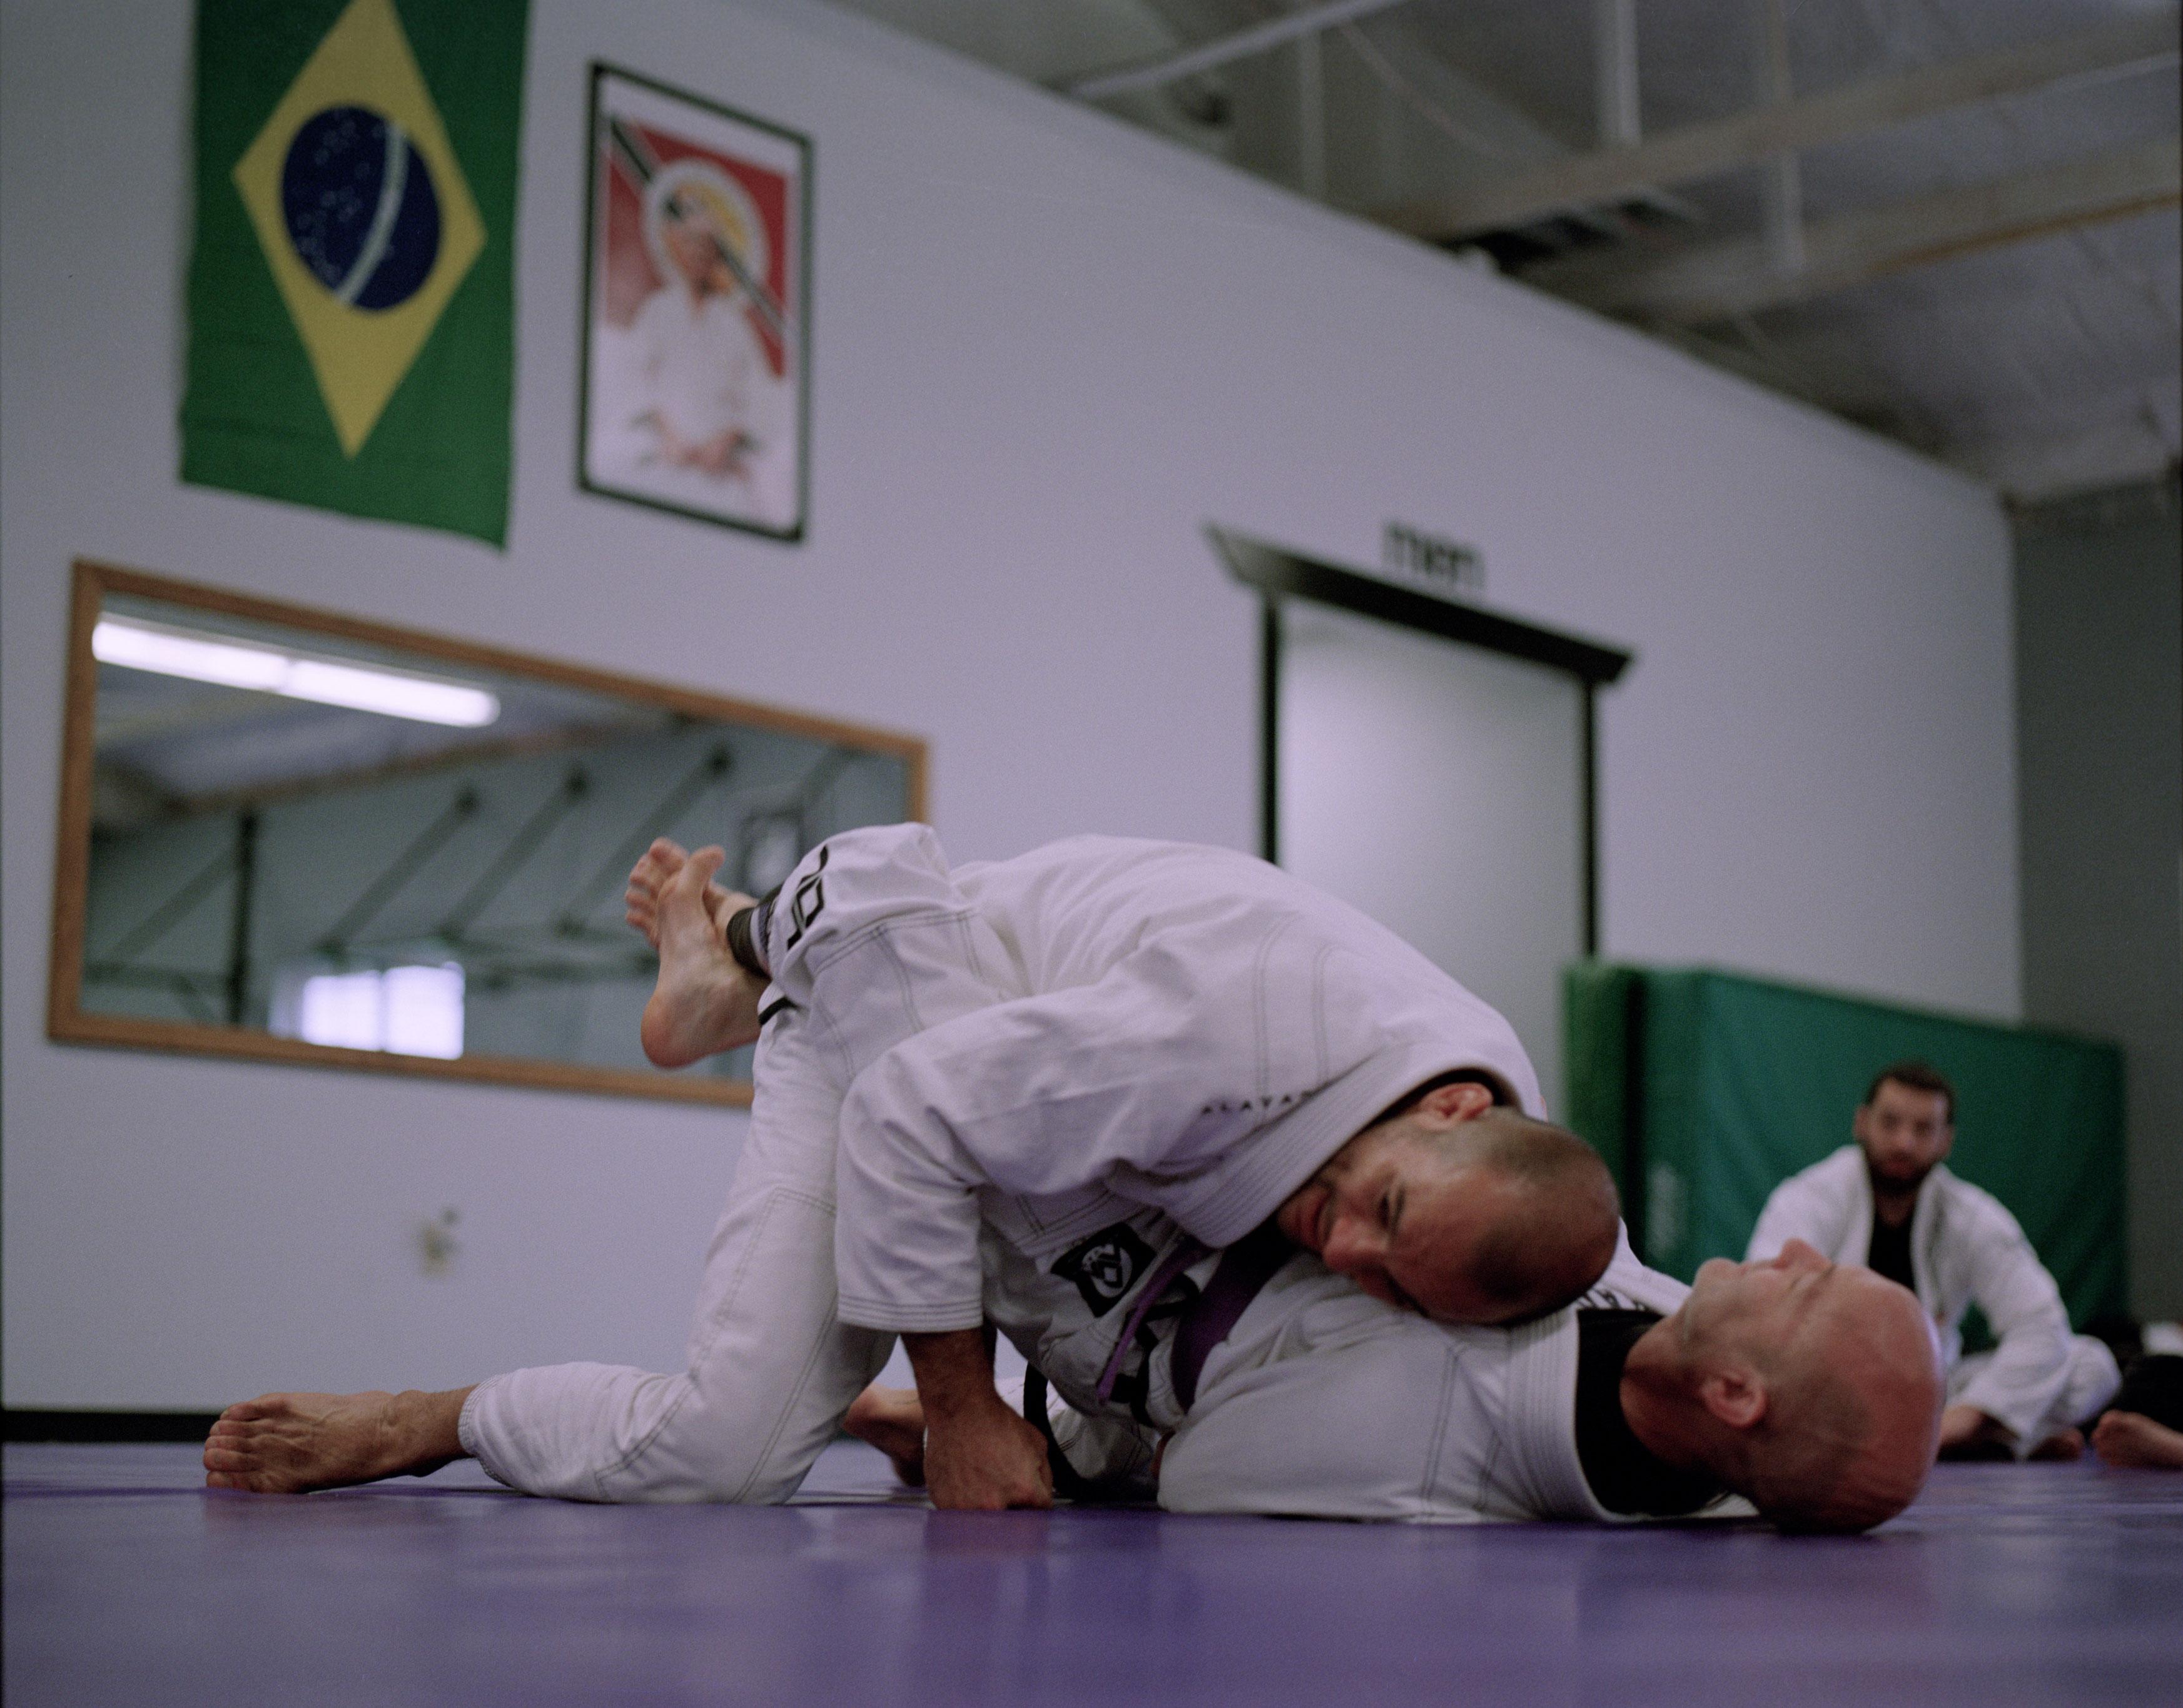 Ryron Gracie rolling with juijitsu instructor, John Ingallina